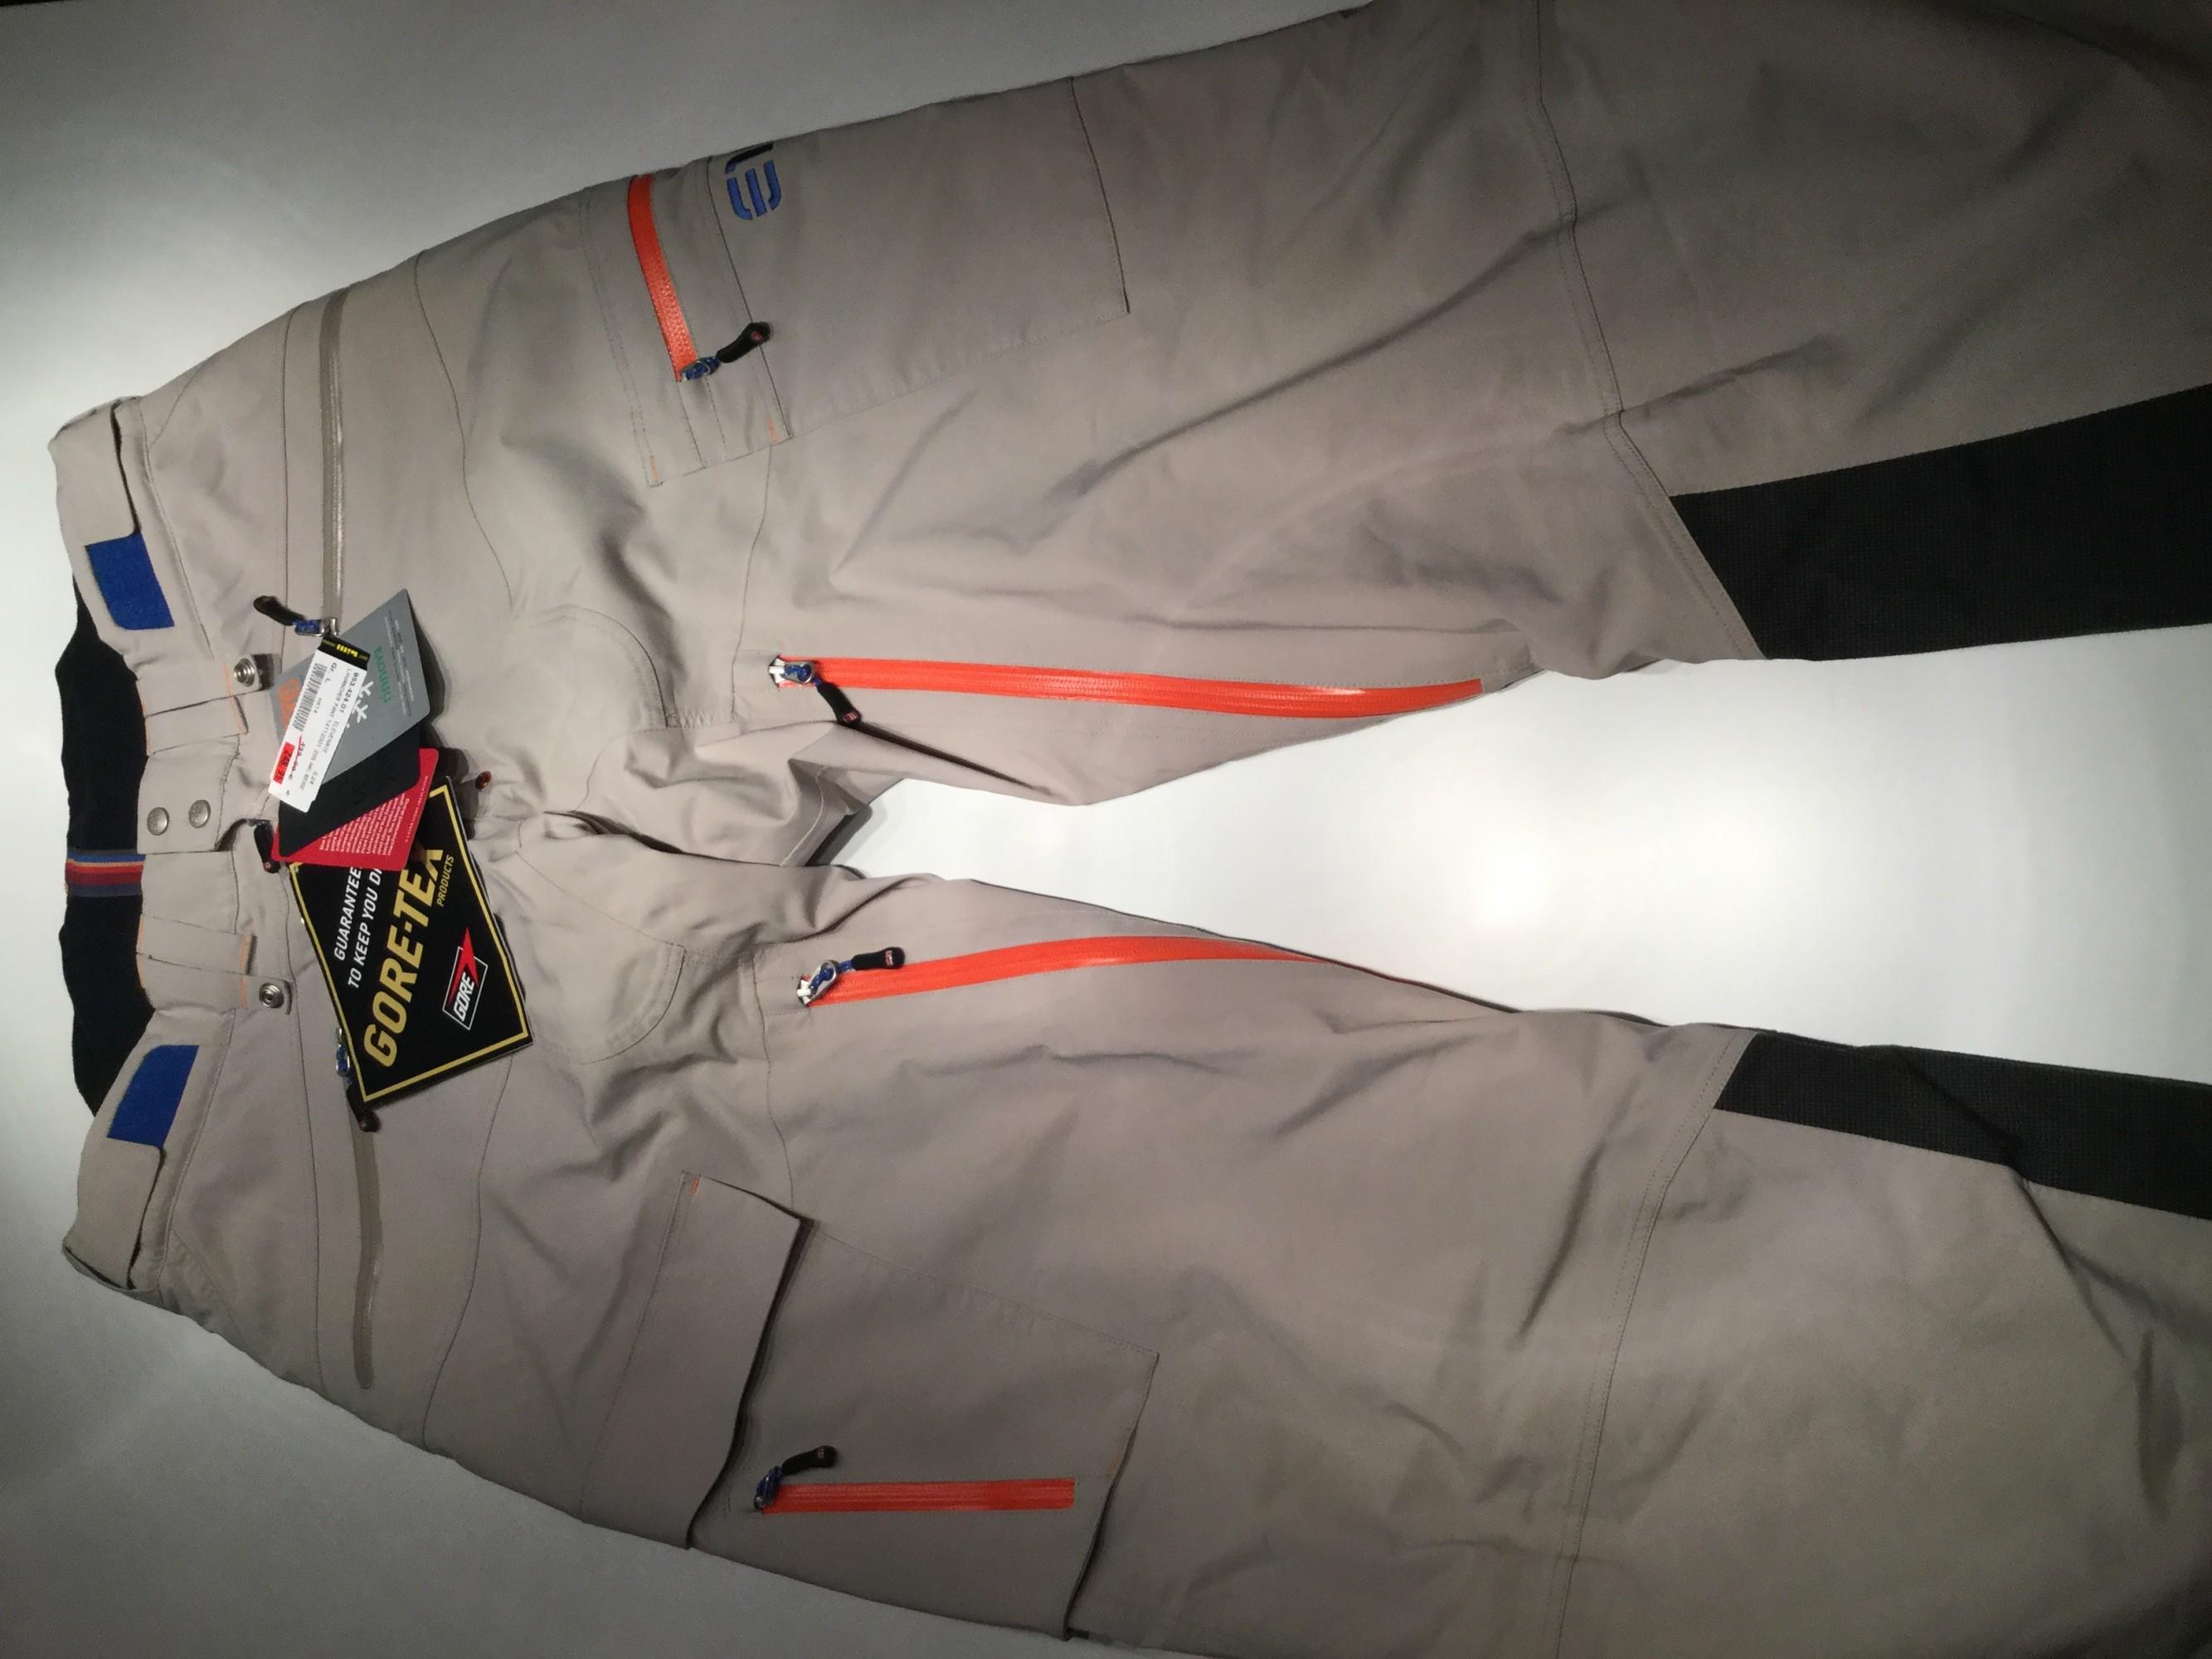 Myydään 2-kerros Gore-Tex -housut Elevenate Lavancher (Miesten  käyttämättömät) 7e19564f60